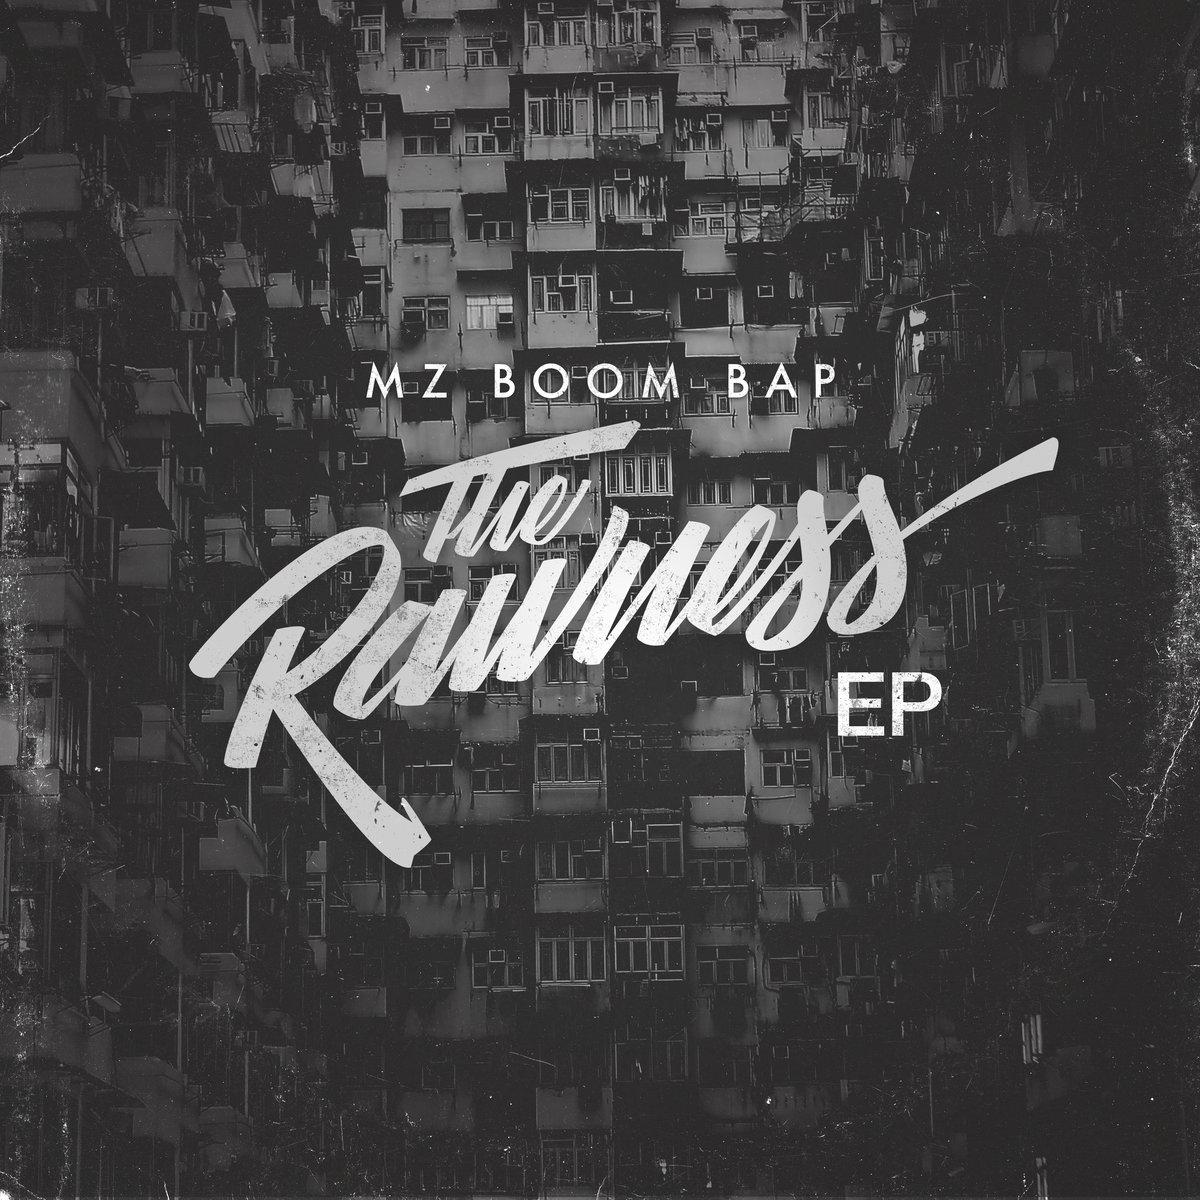 Mz_boom_bap_presenta_the_rawness_ep